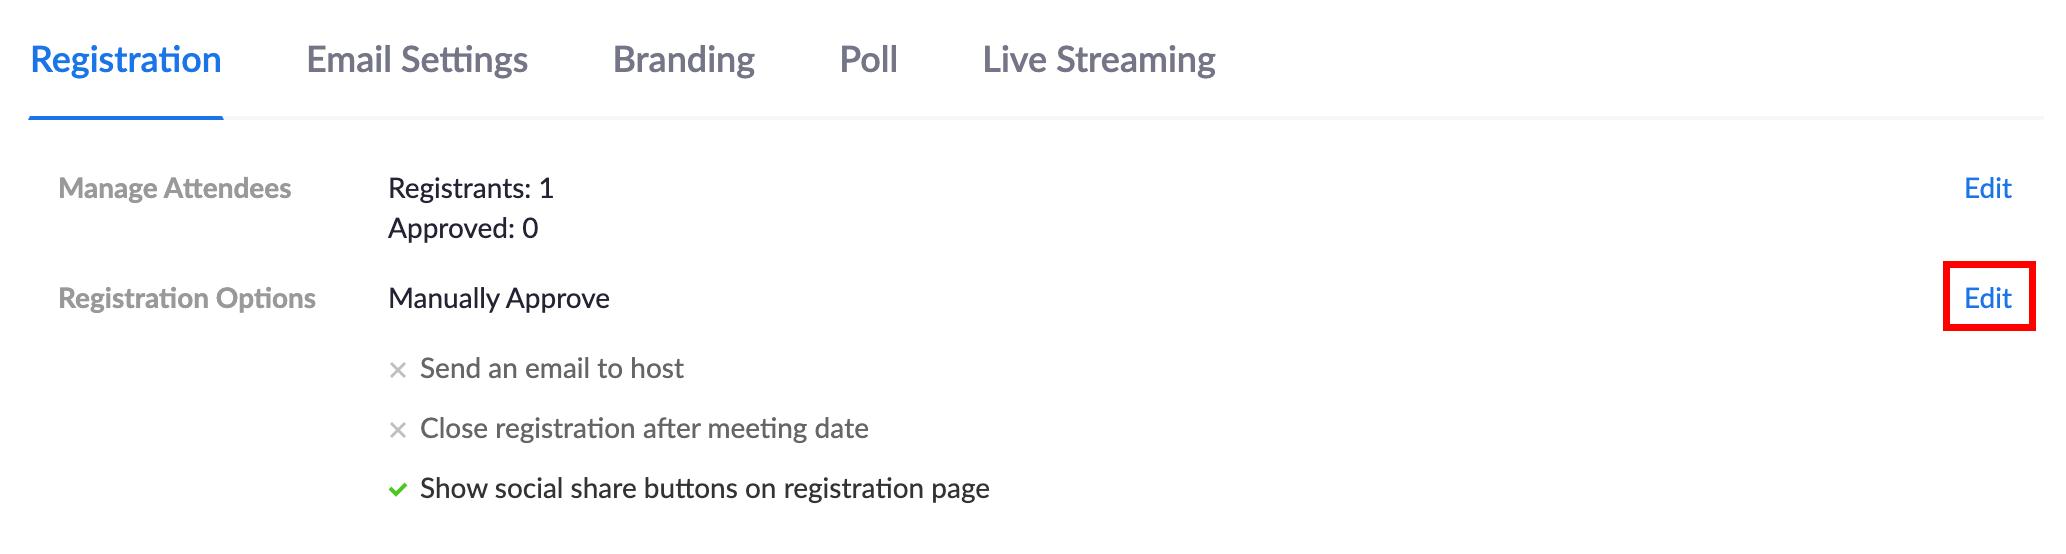 Edit Registration Settings